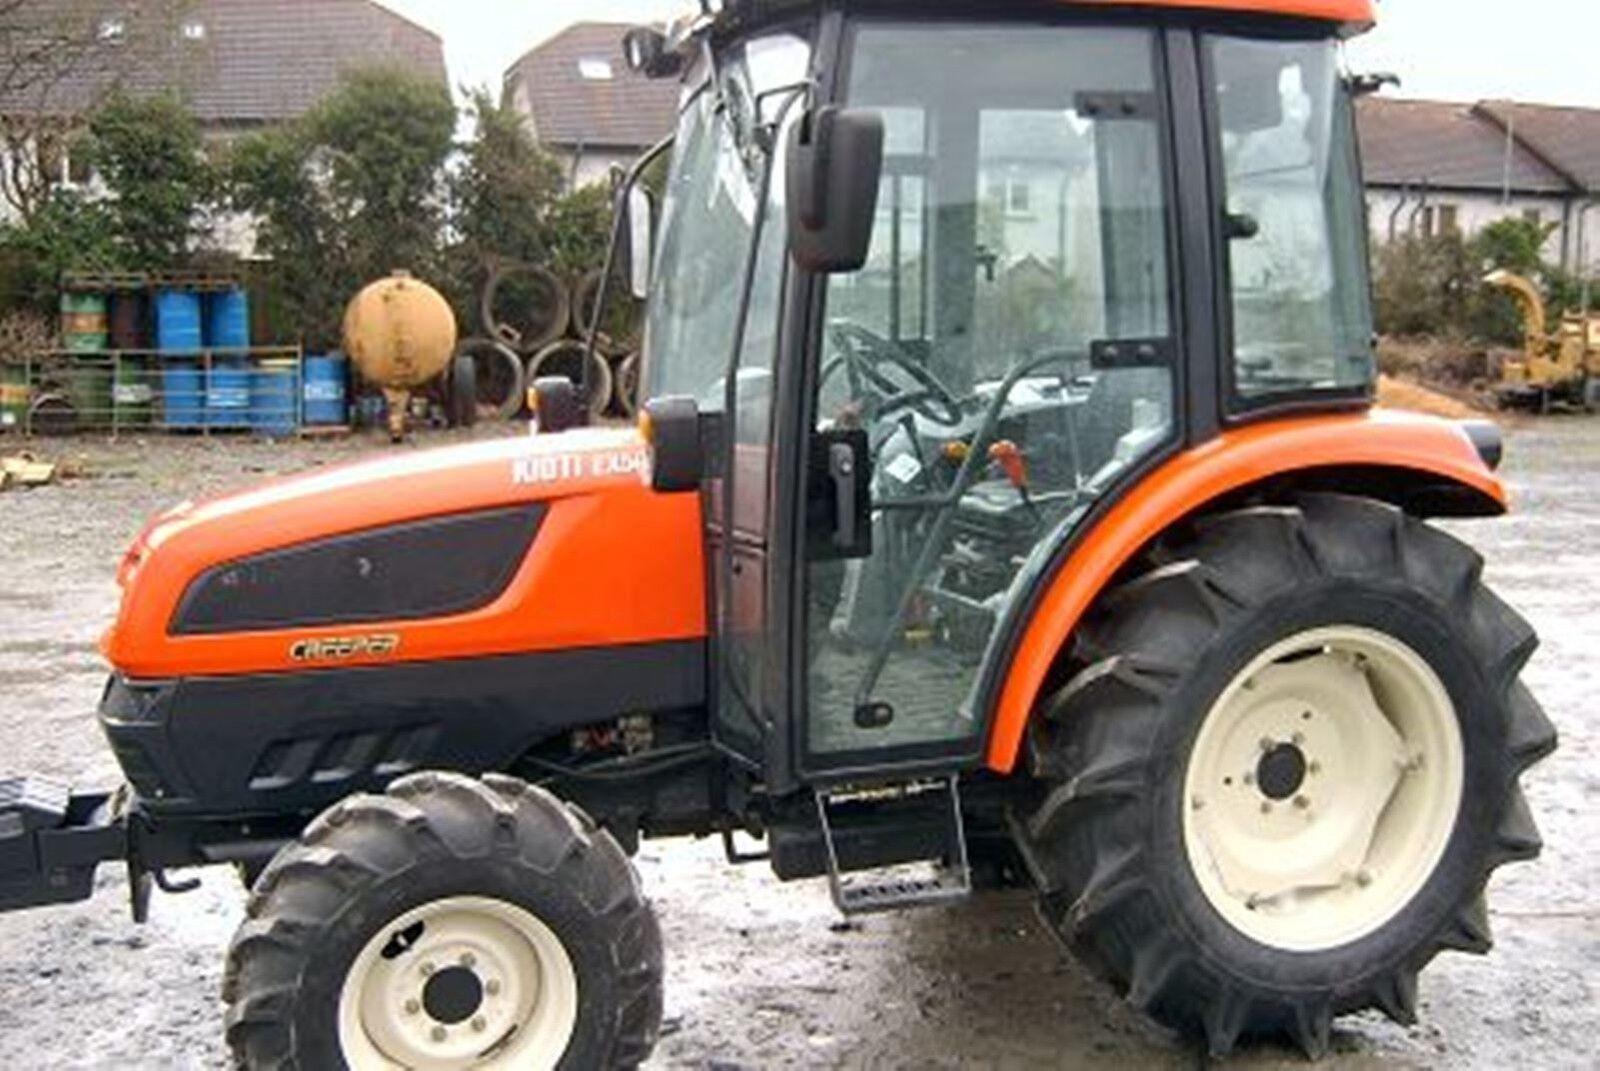 Kioti Ex 40 50 Tractor Workshop Parts Manuals Pdf Cd 495 Engine Diagram 4 Of 7 5